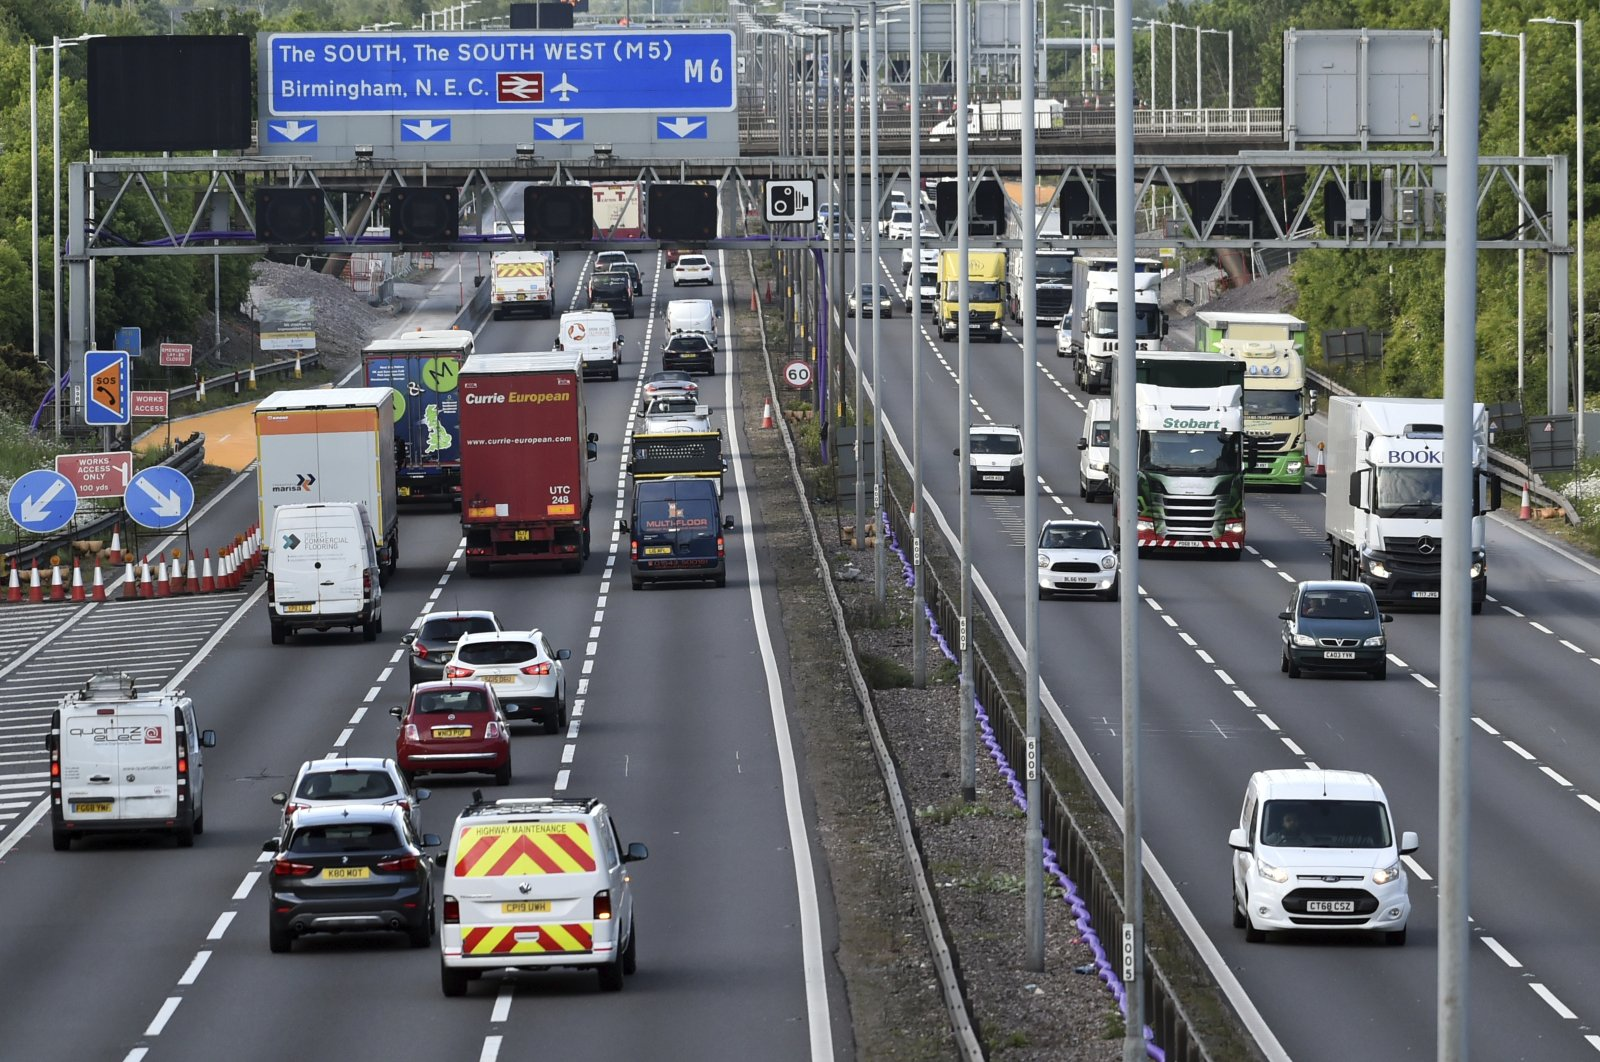 Traffic moves along the M6 motorway near Birmingham, May 18, 2020. (AP Photo)